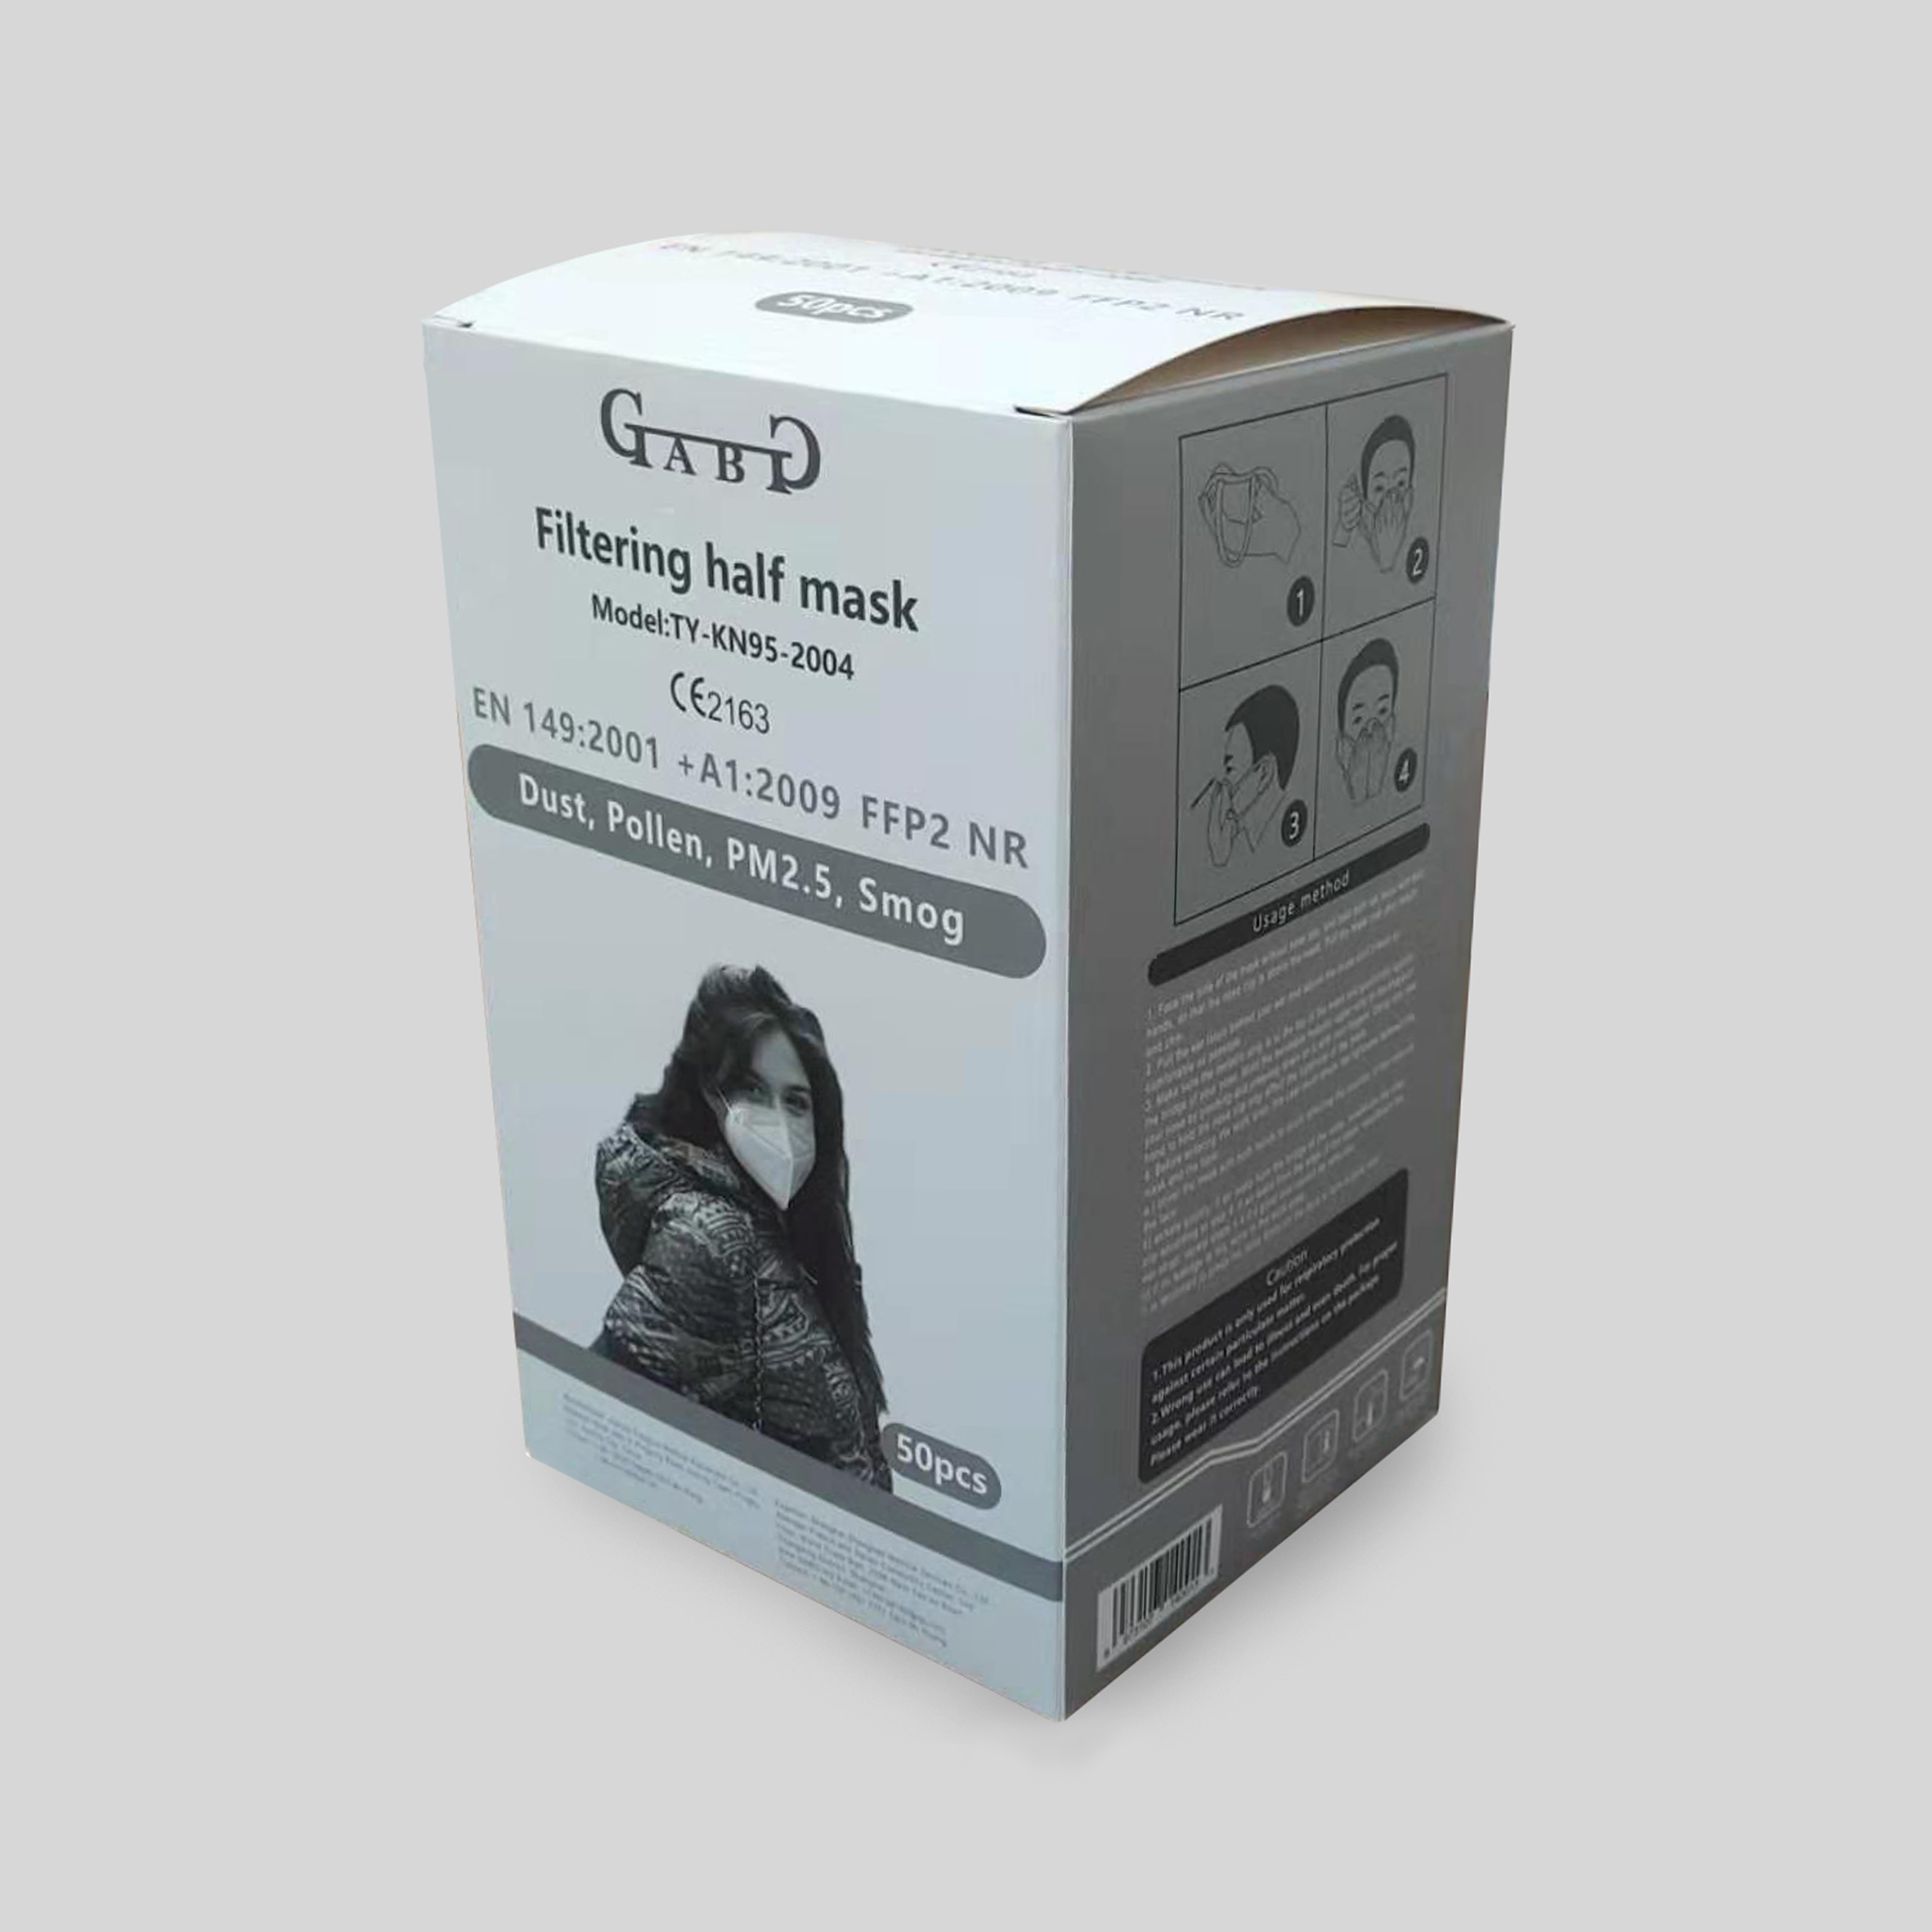 immagine packaging mascherina protettitva FFP2 GABG